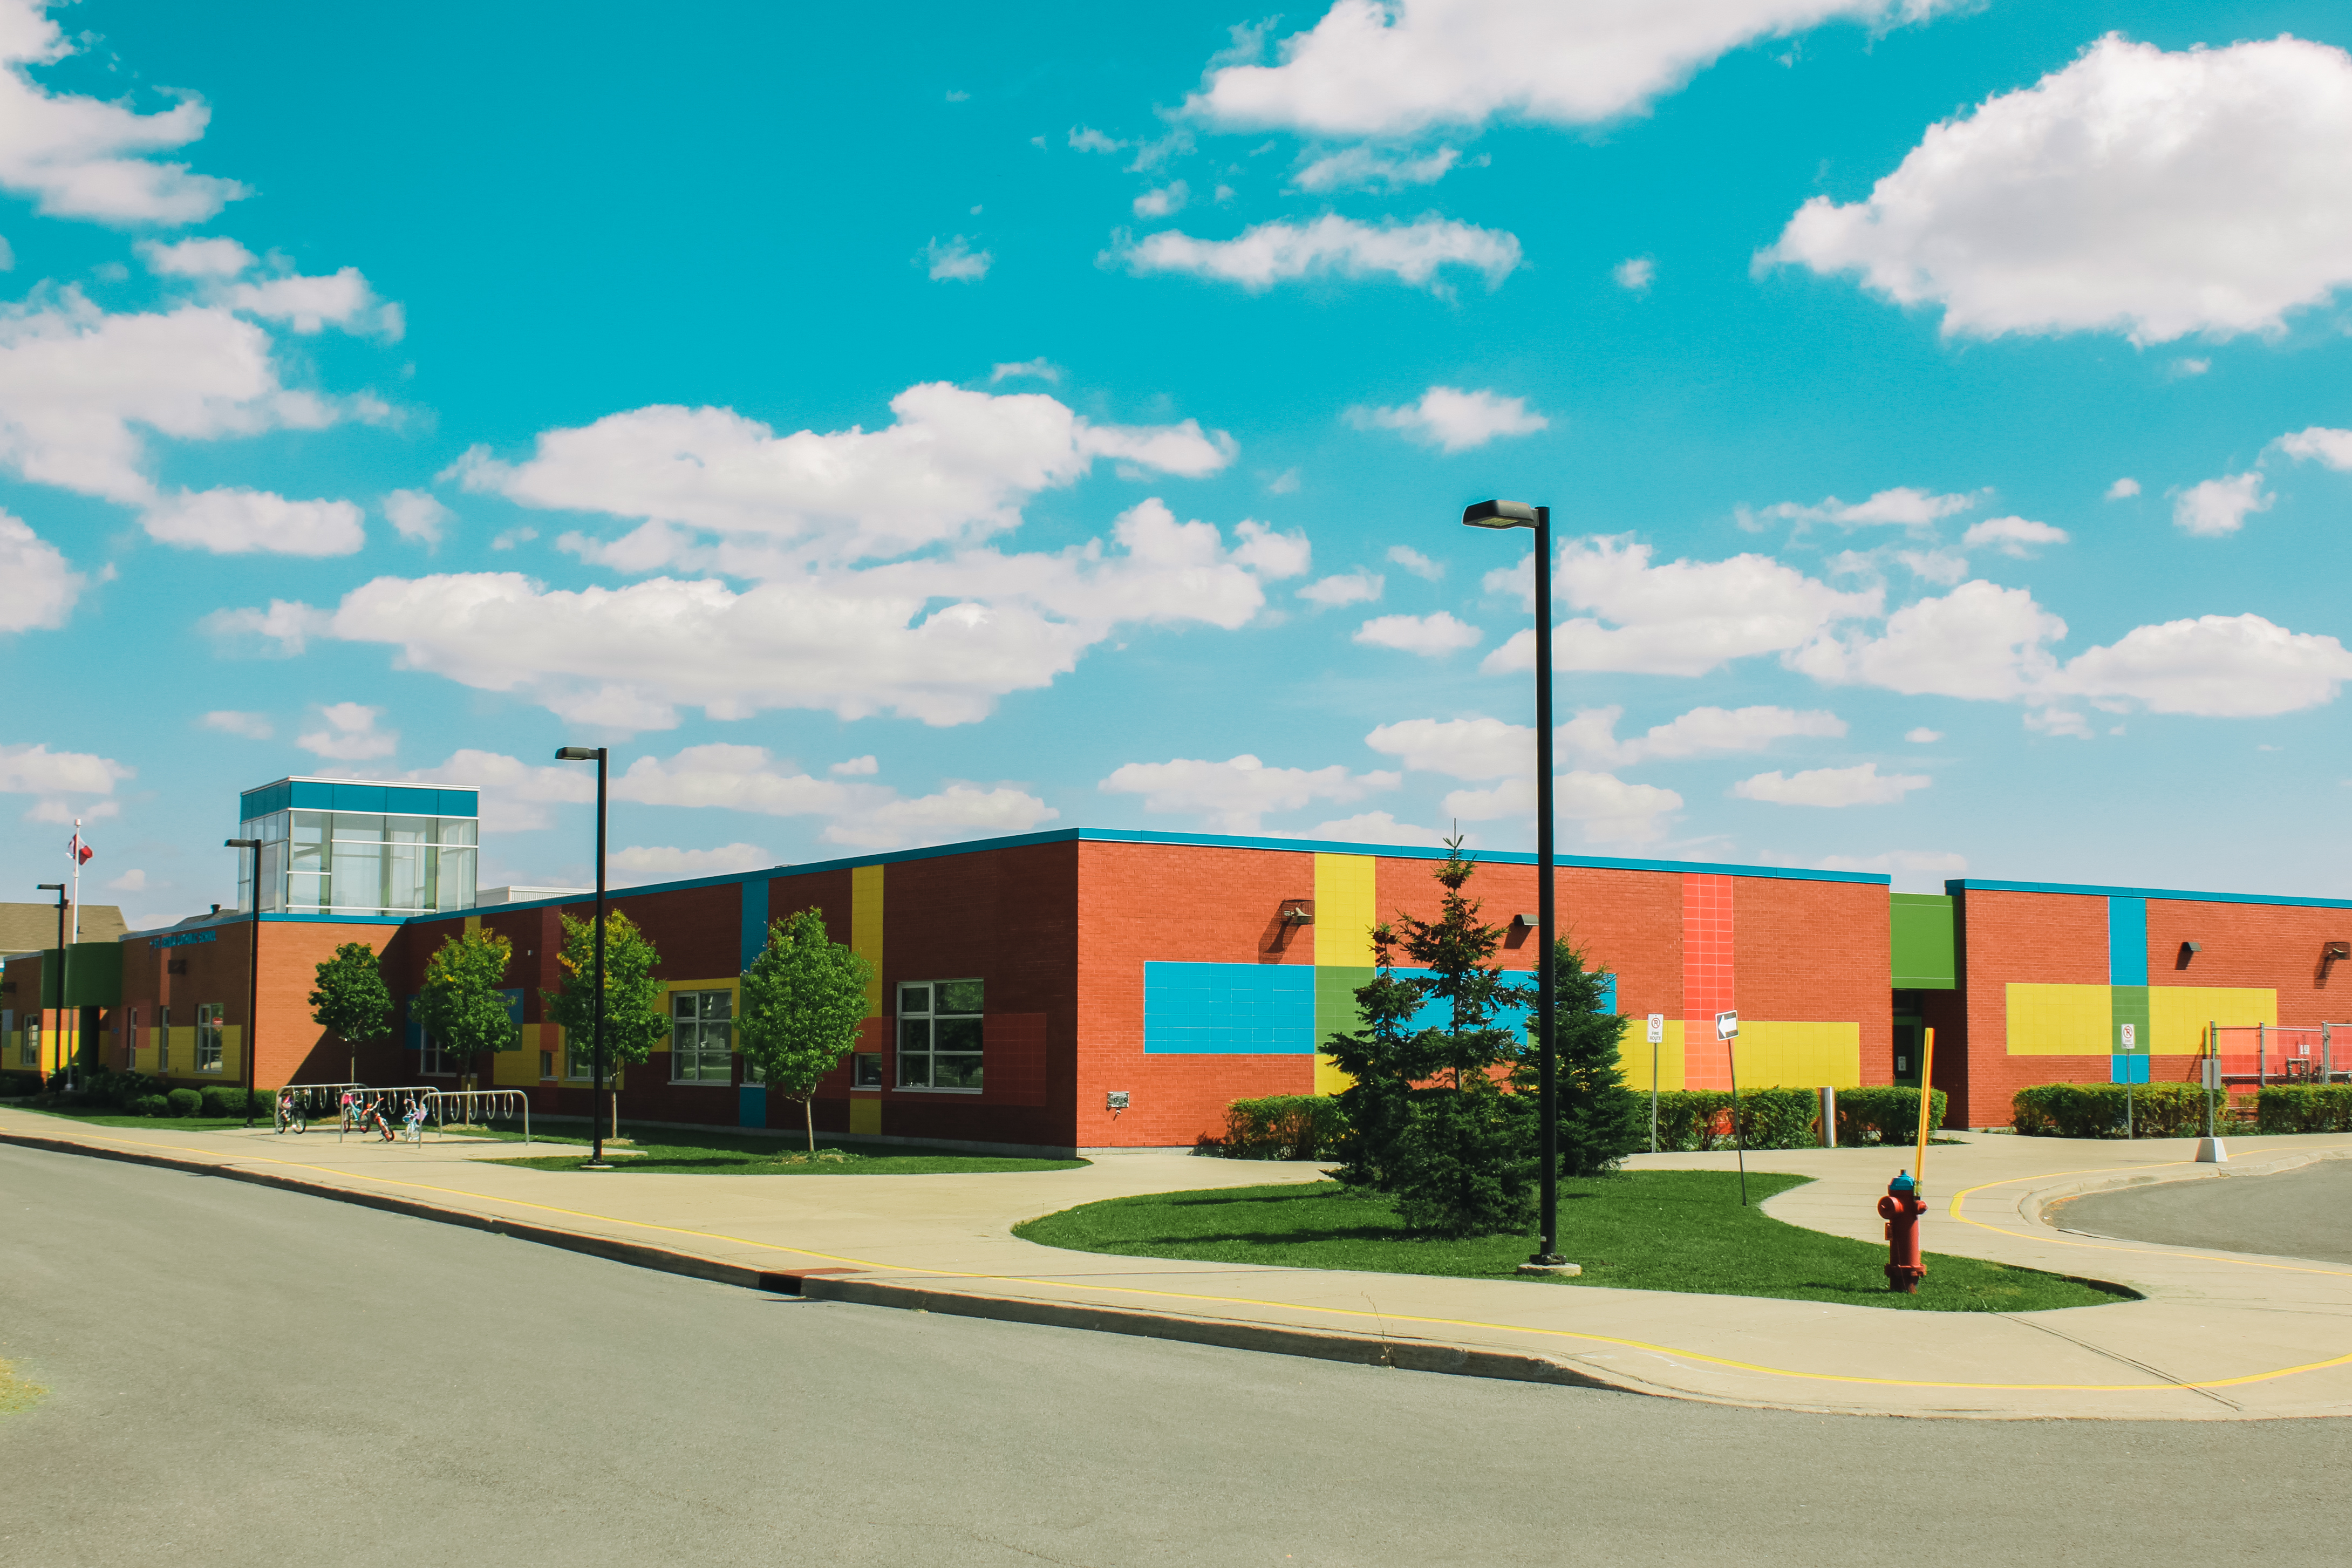 Barhaven Elementary School